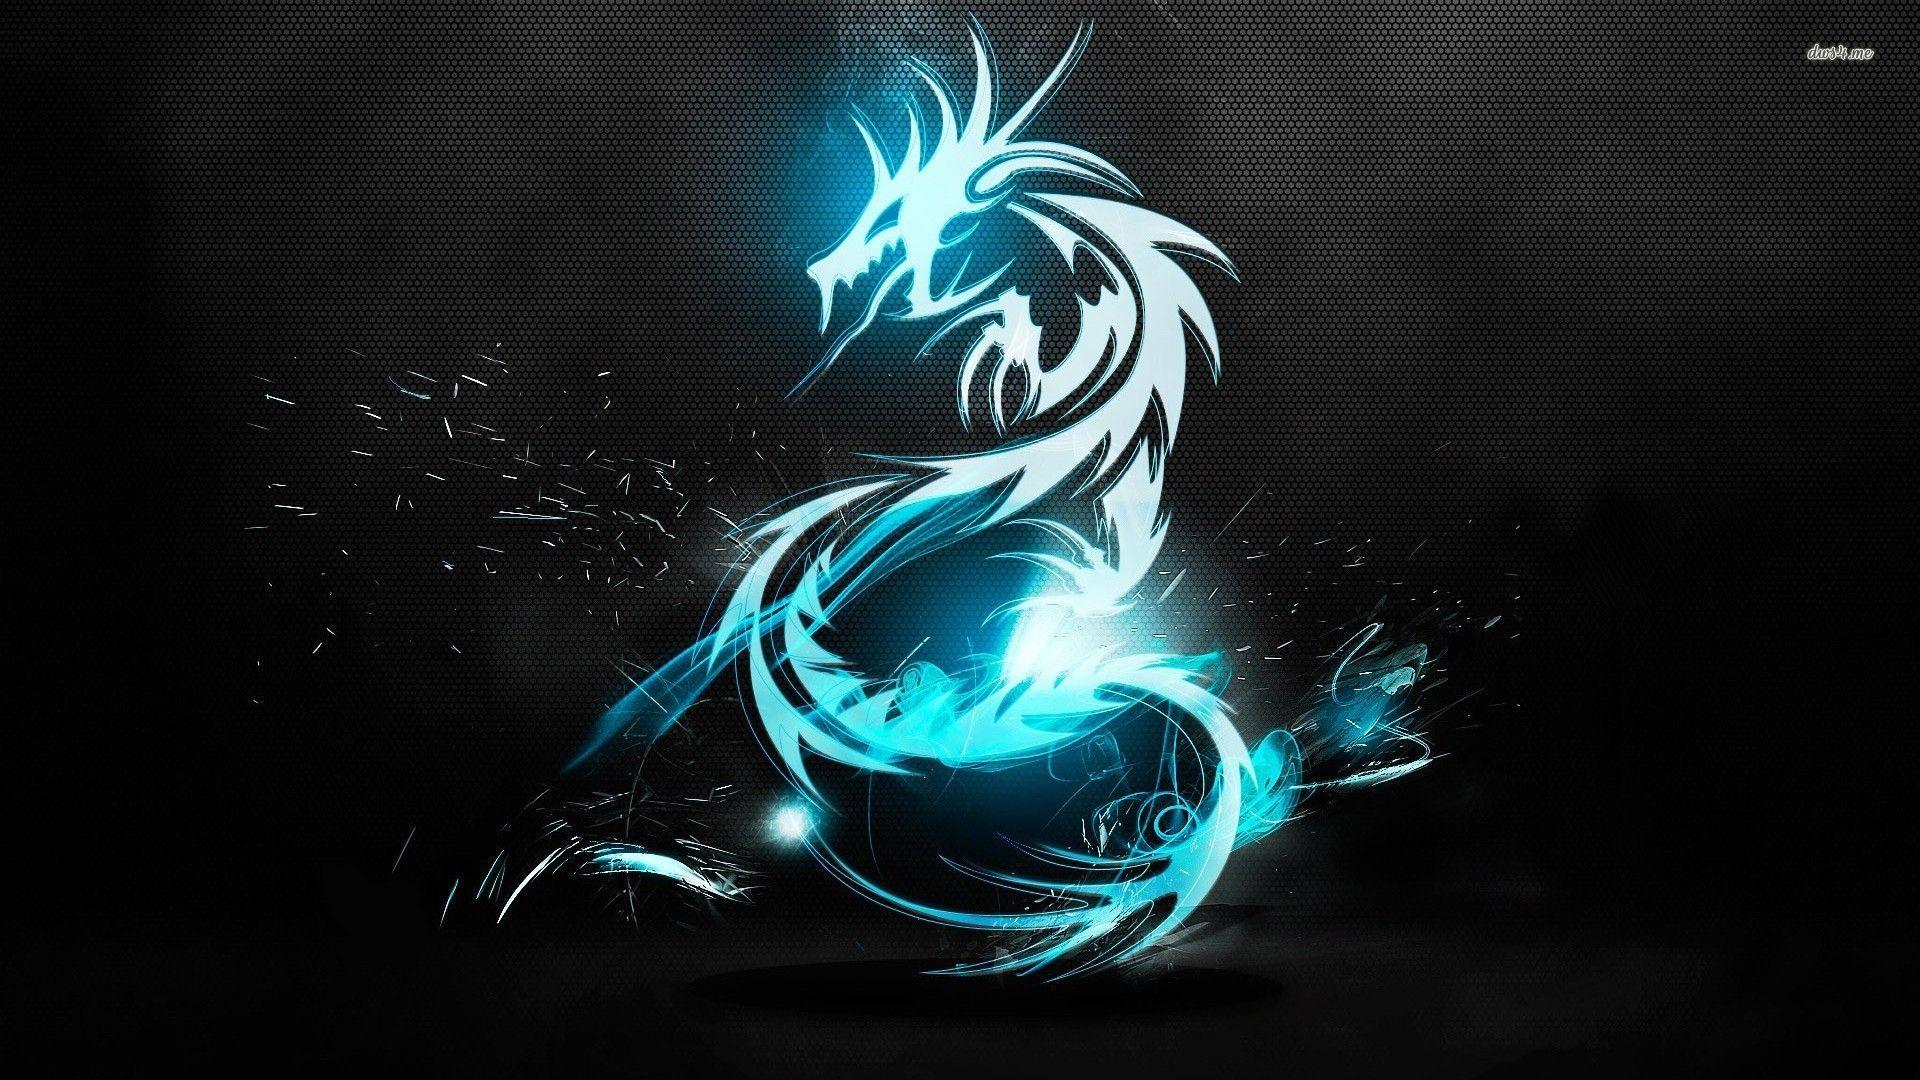 Blue Dragon HD Wallpapers 9 BlueDragonHDWallpapers BlueDragon Hdwallpapers